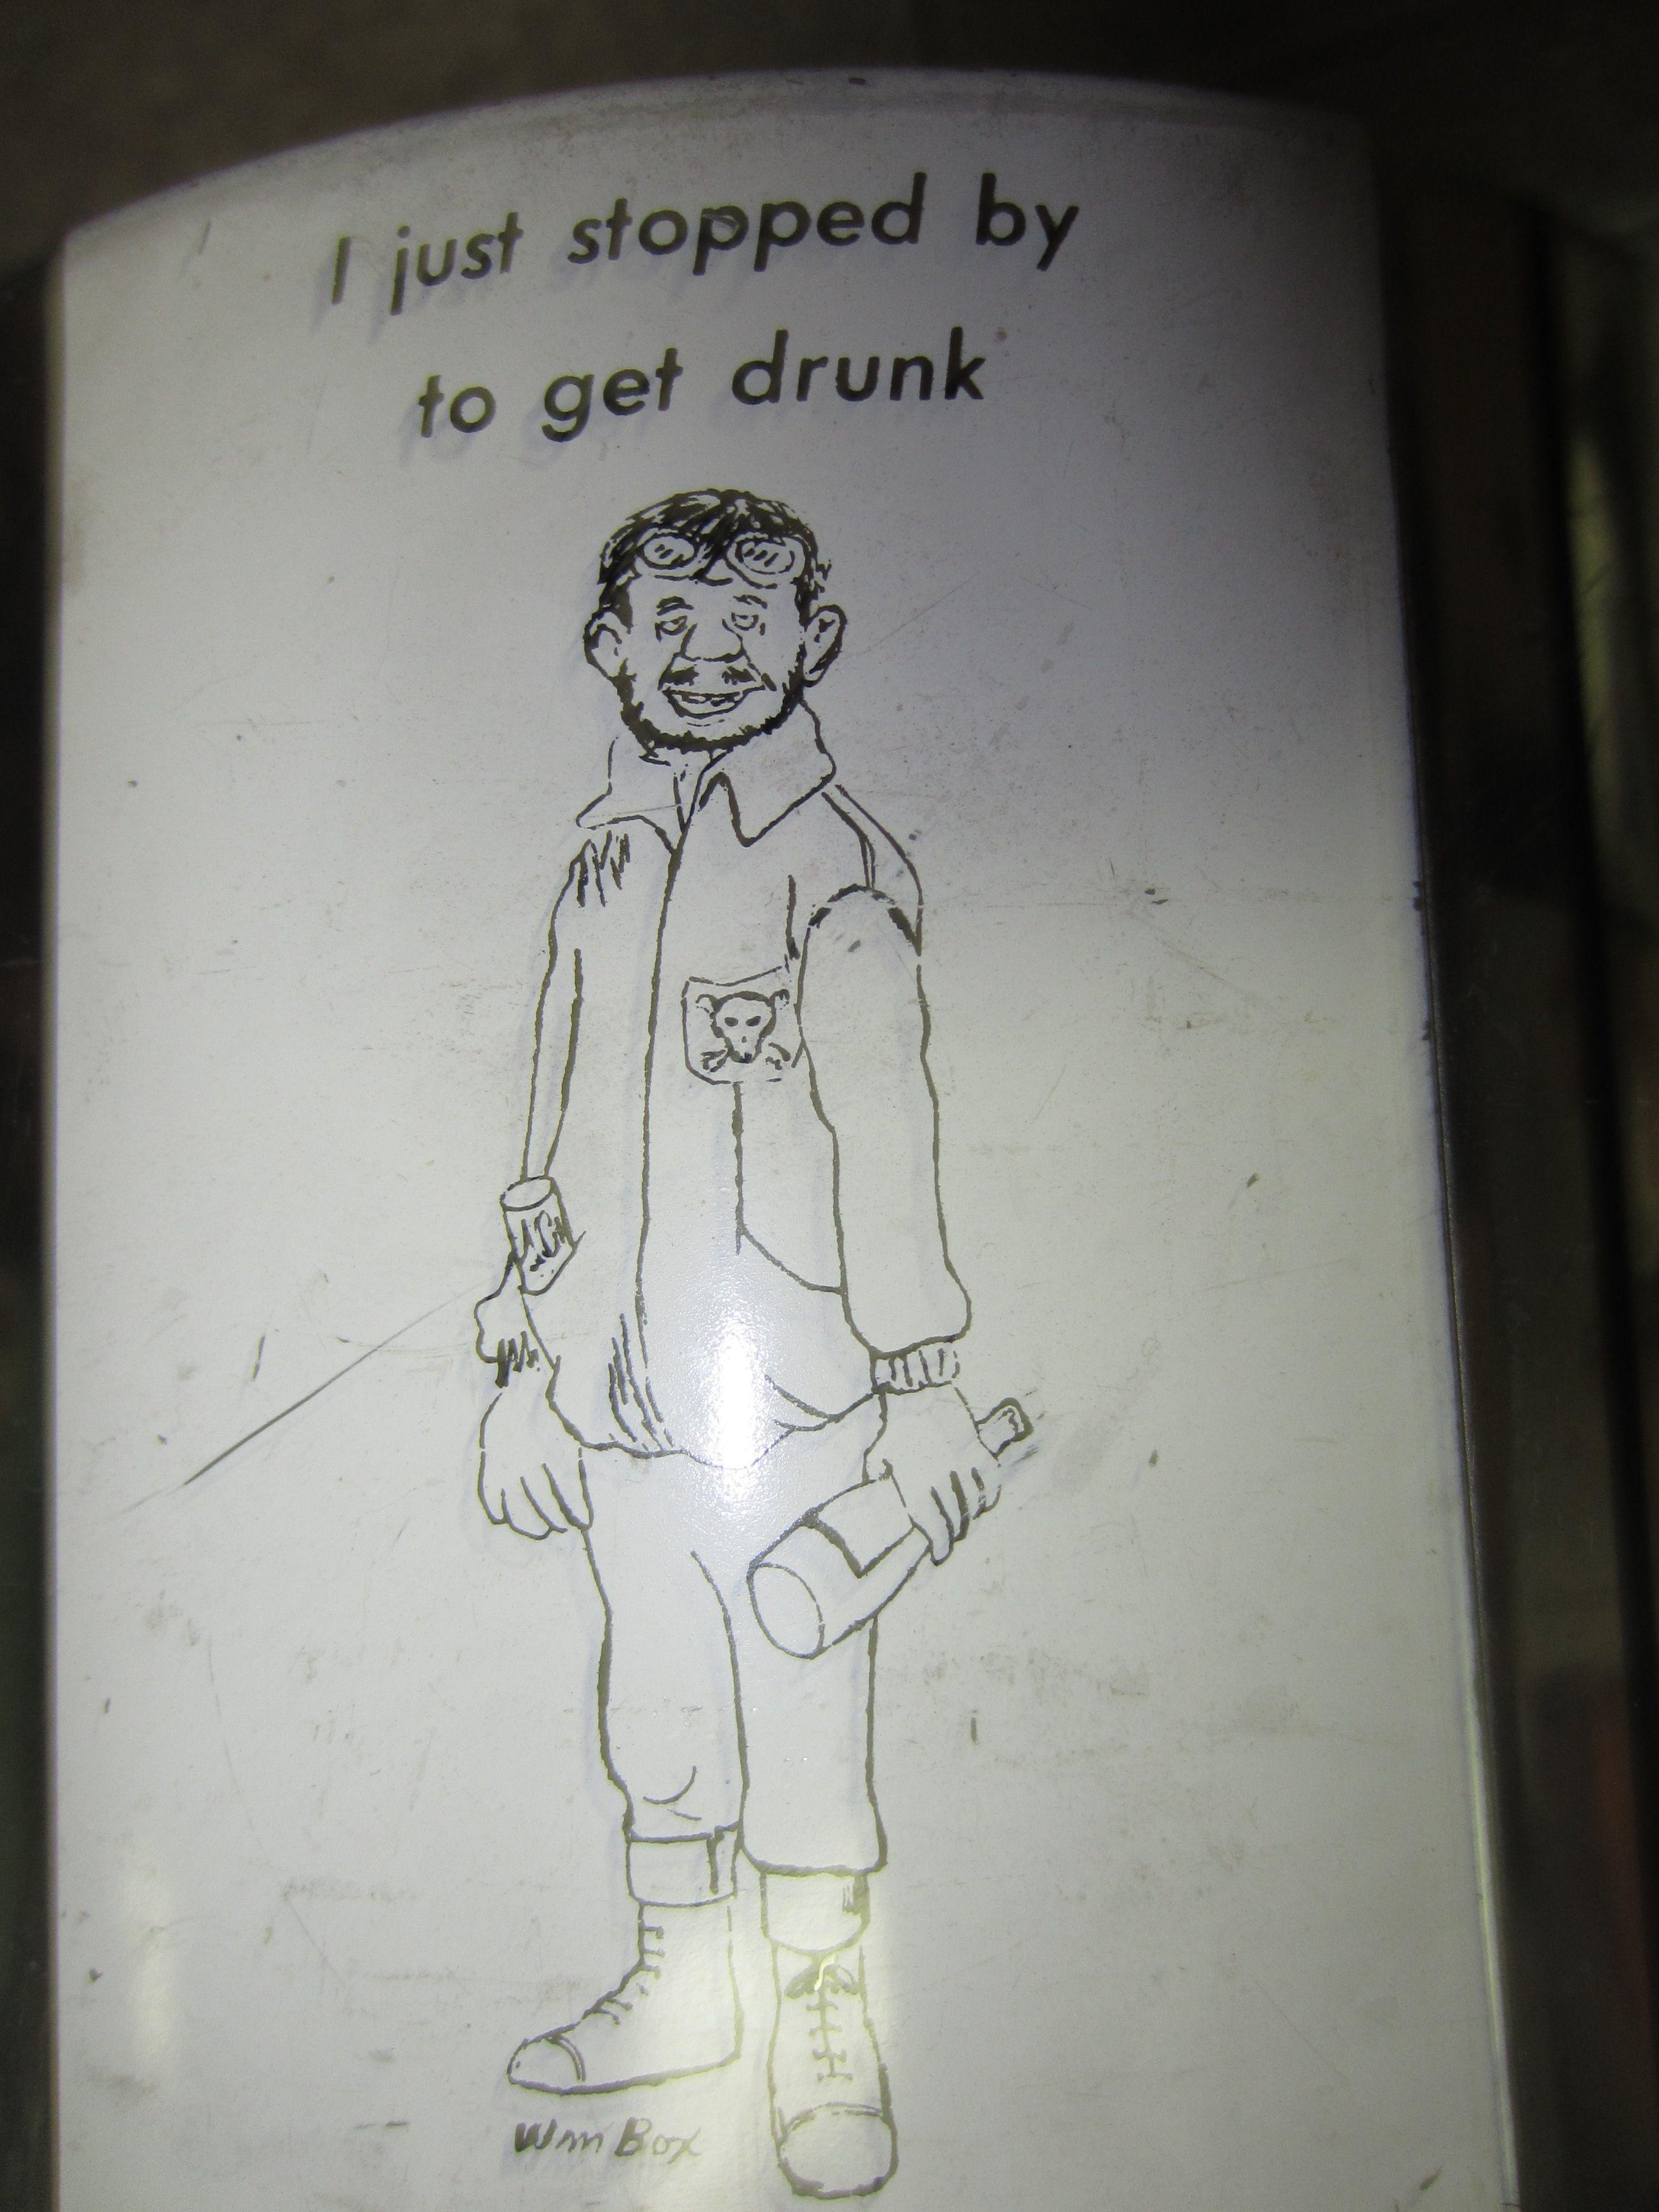 Vintage Fabcraft Ice Bucket Wm Box Cartoons Barware Humor 1950 #kookykitsch.com